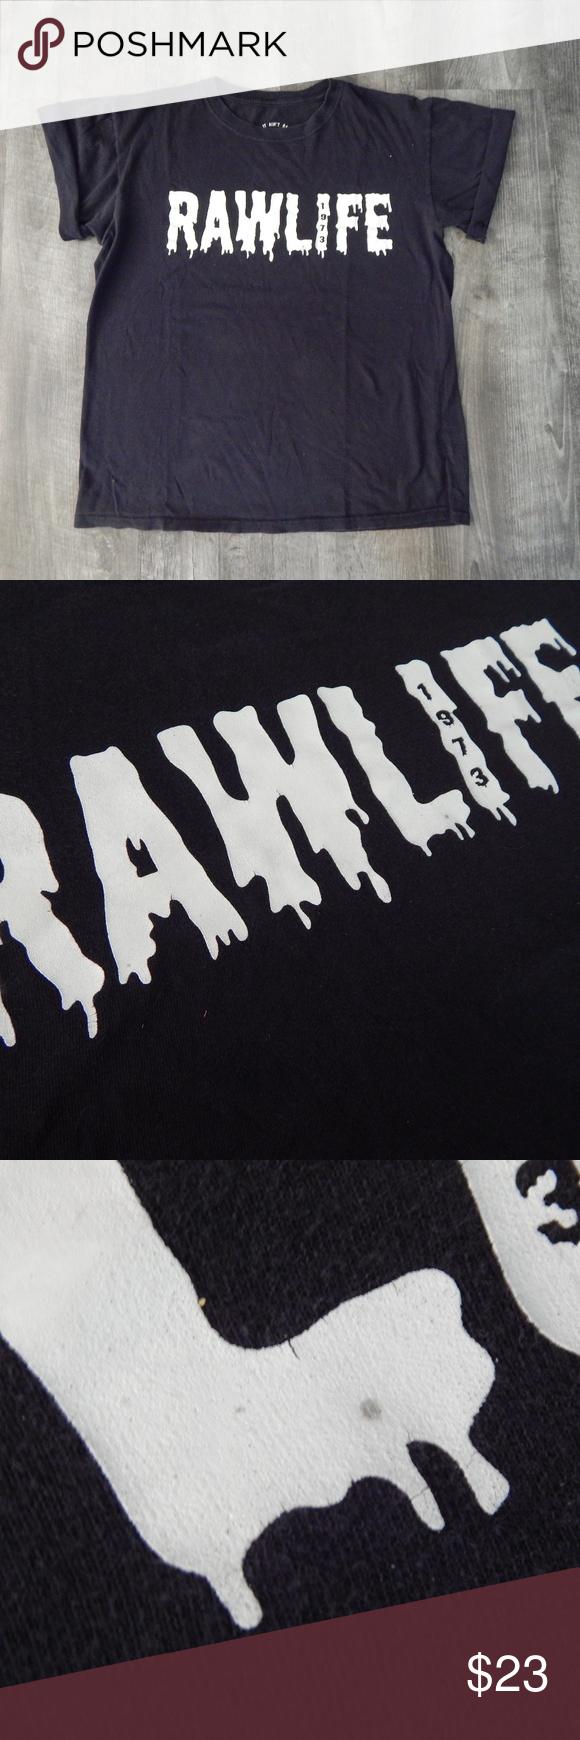 Raw Drip Logo T Shirt Tshirt Logo Clothes Design T Shirts For Women